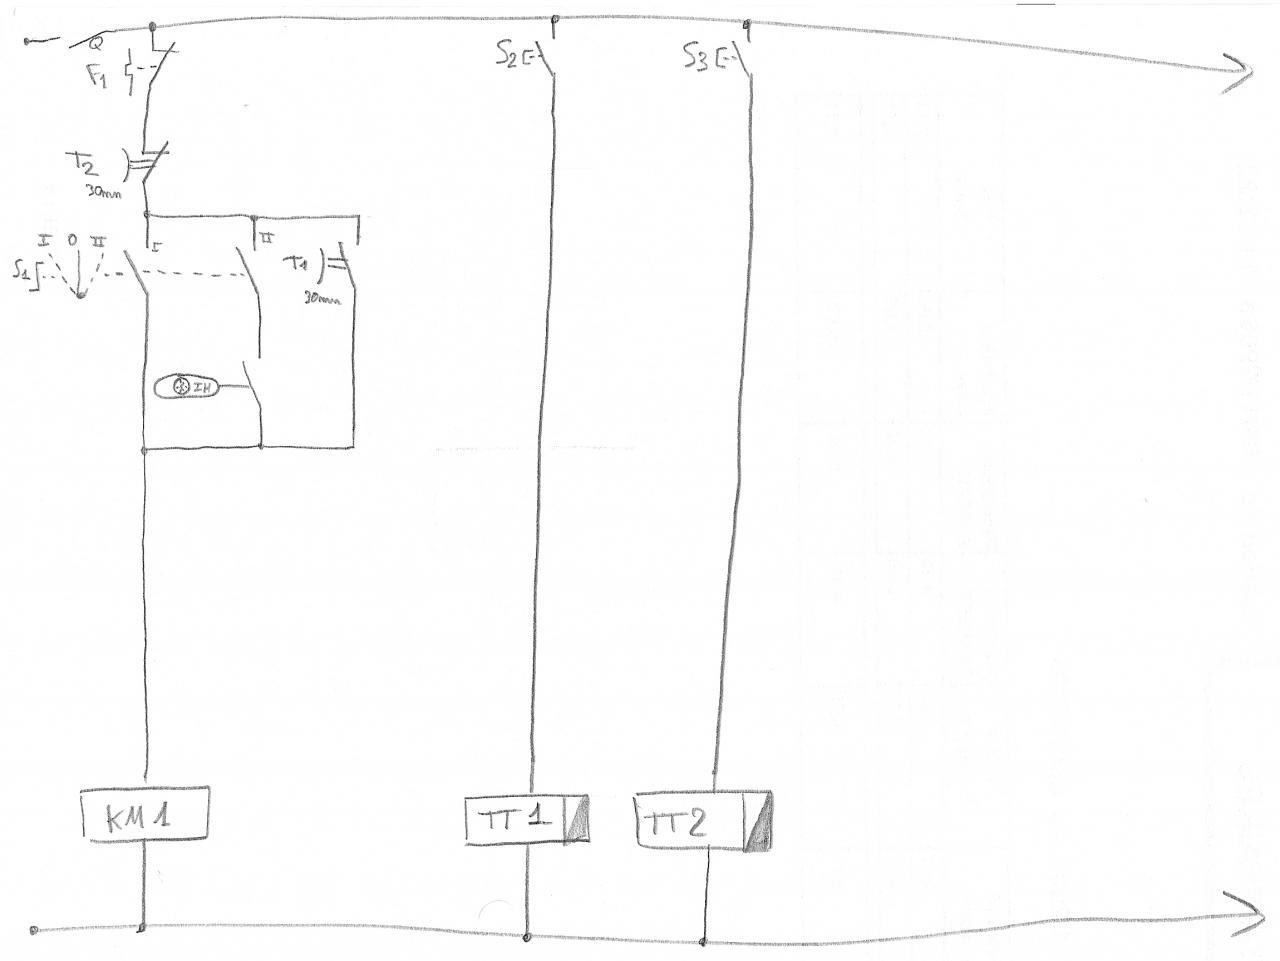 Système gestion piscine 906809Scan2001